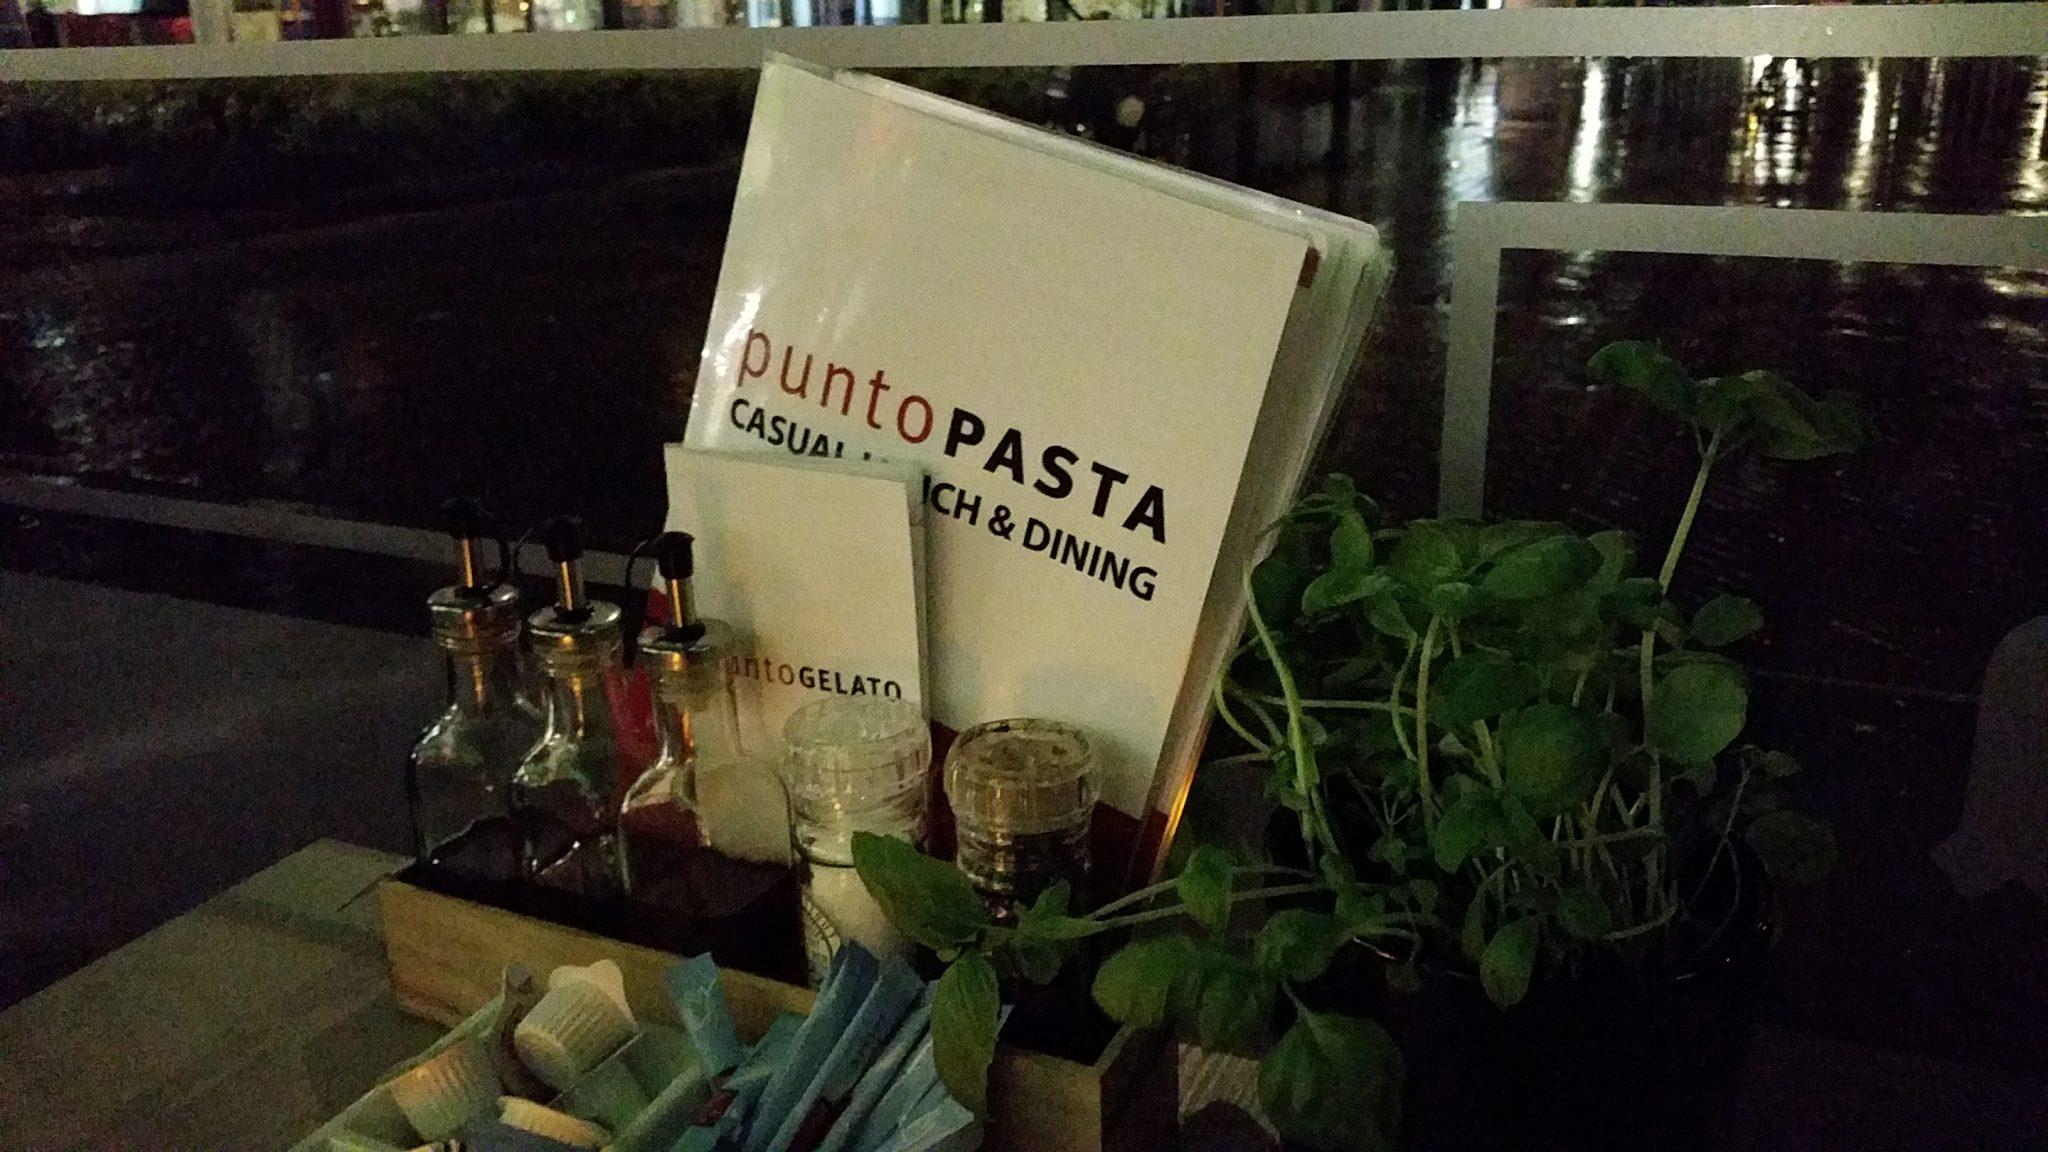 Eat&Drink: Punto Pasta | Enschede - 2015 02 20 19.41.44